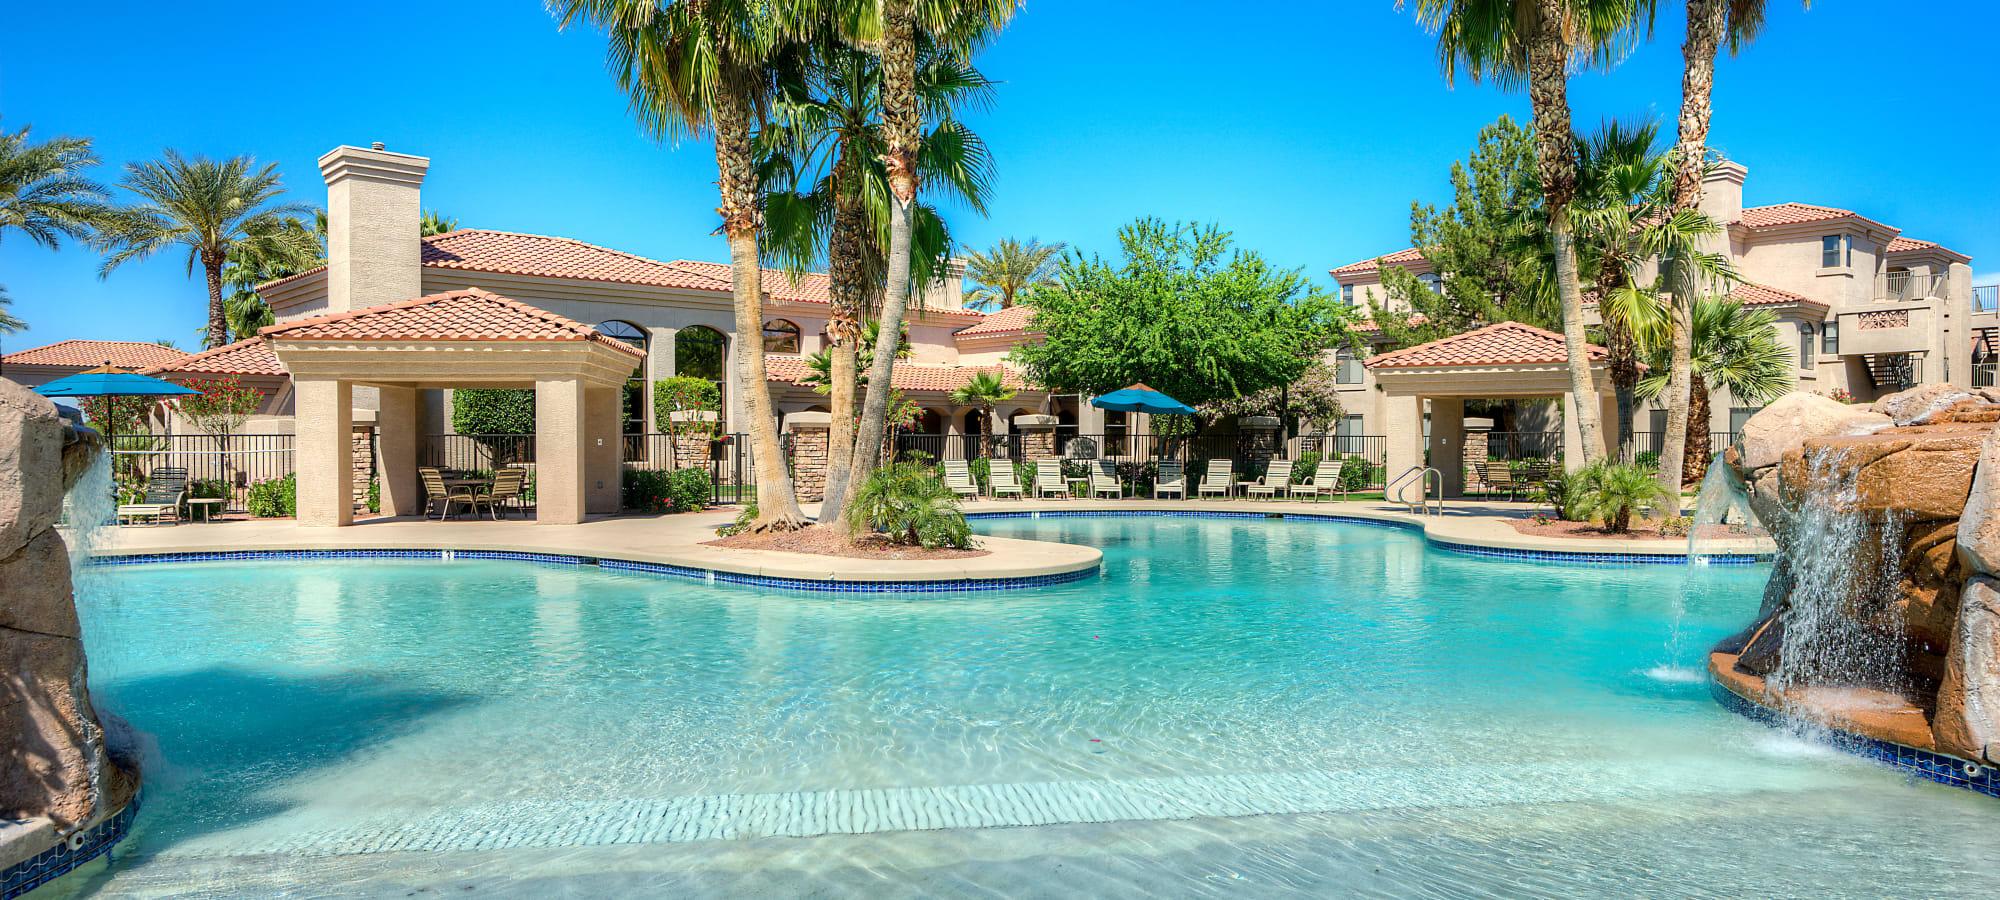 Beautiful swimming pool area at San Pedregal in Phoenix, Arizona